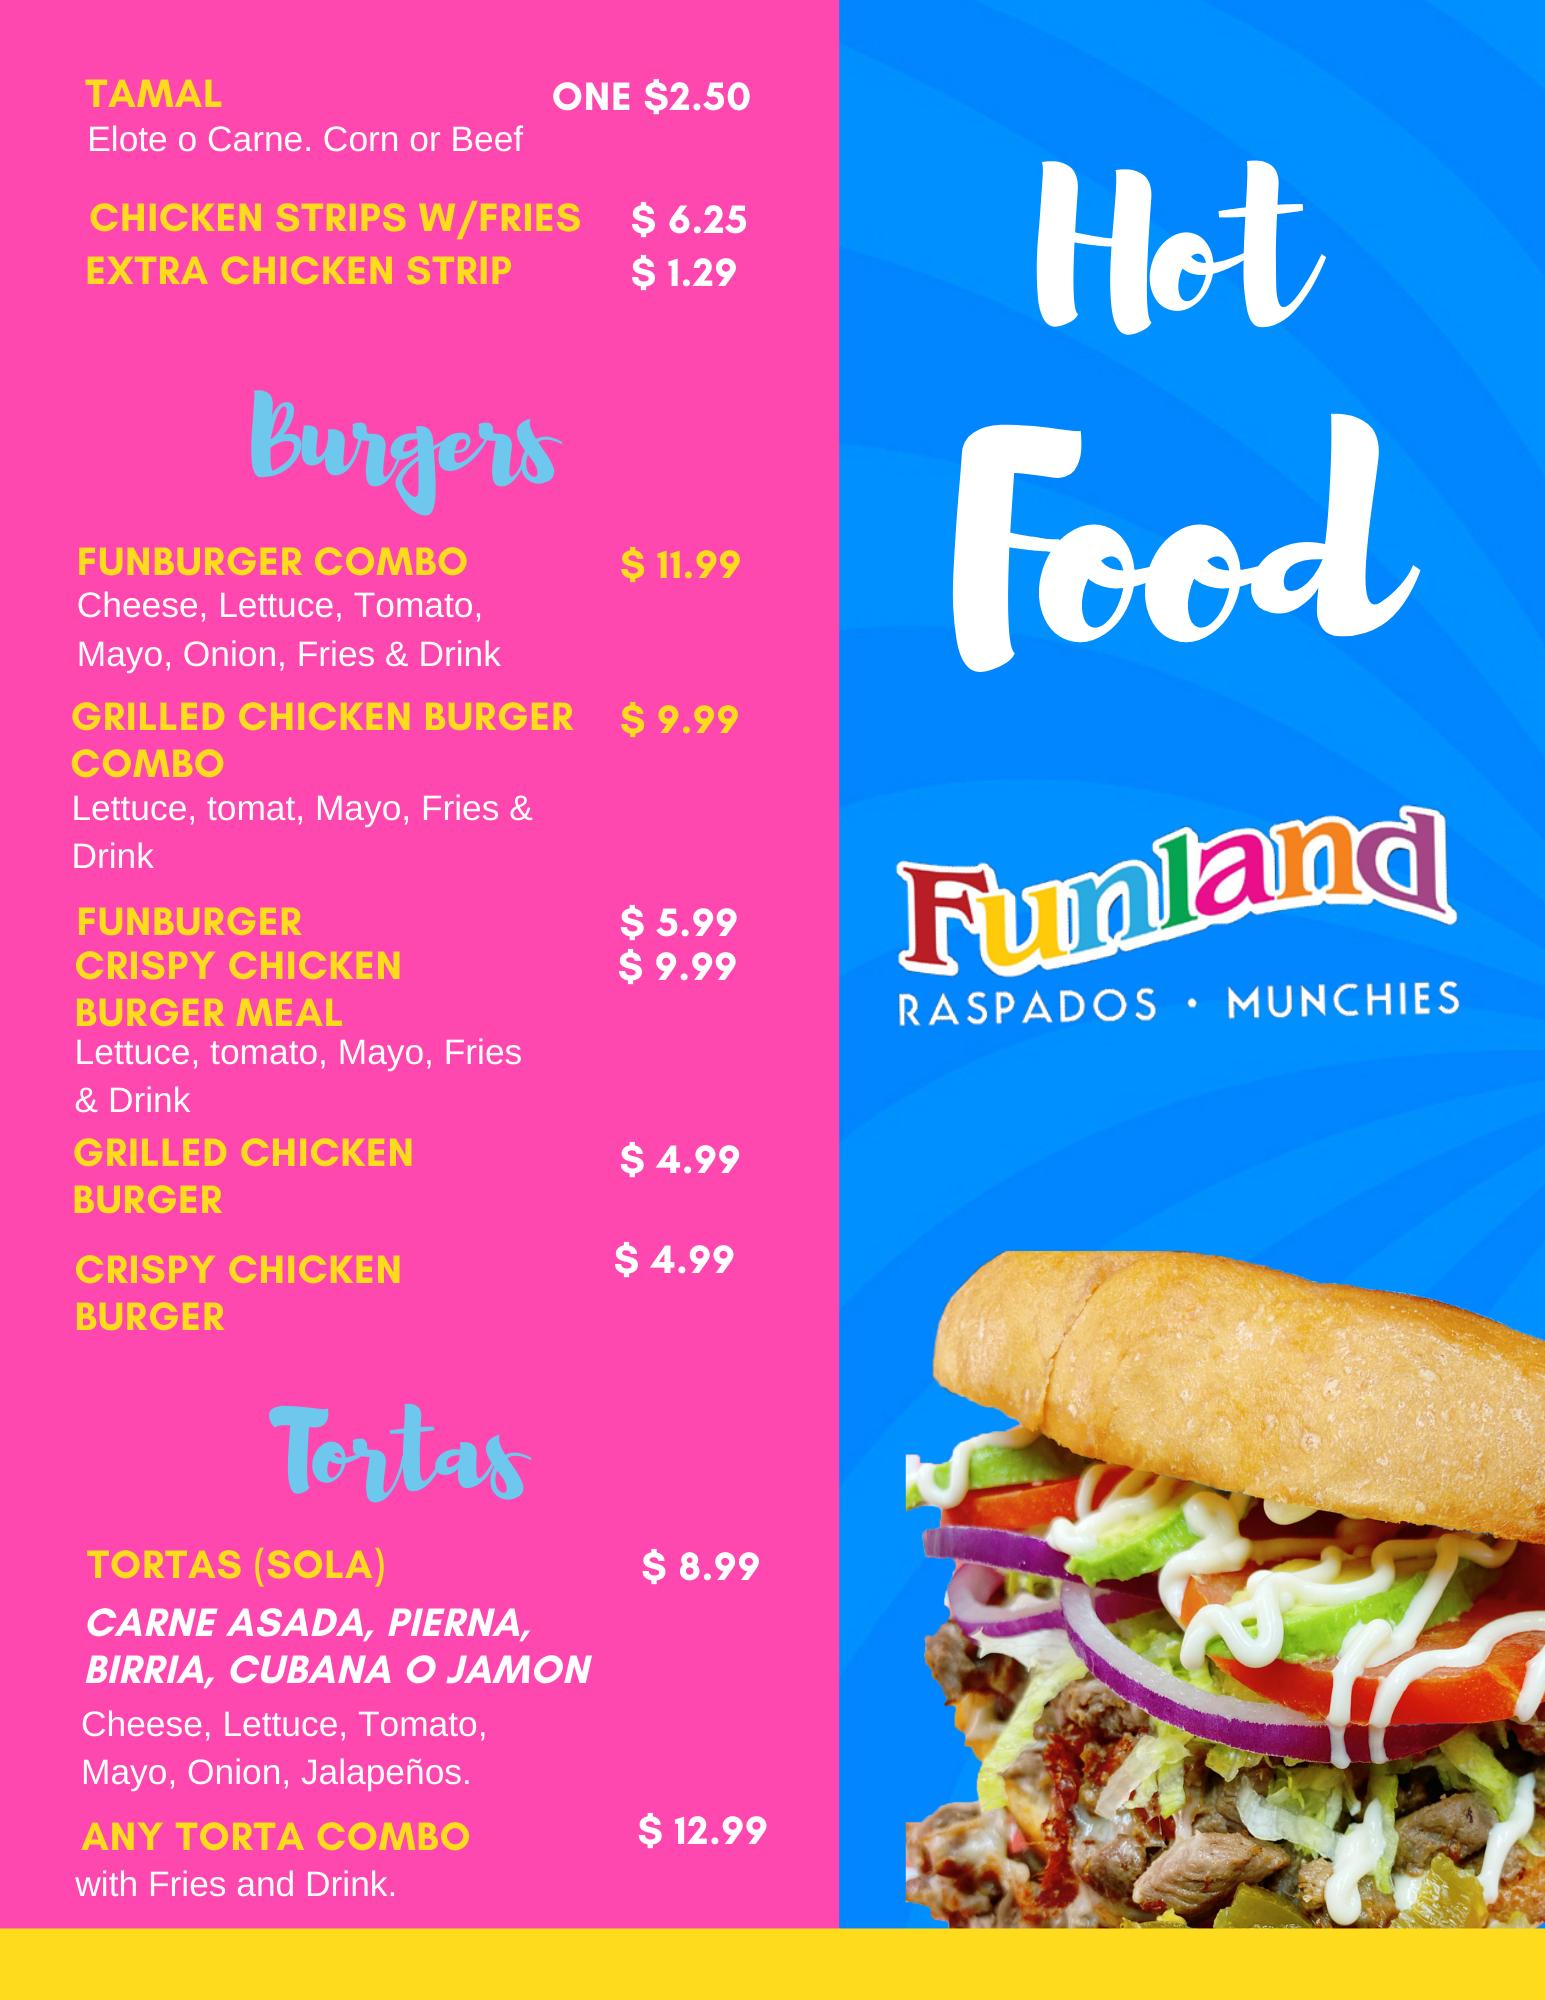 Funland - Munchies Menu